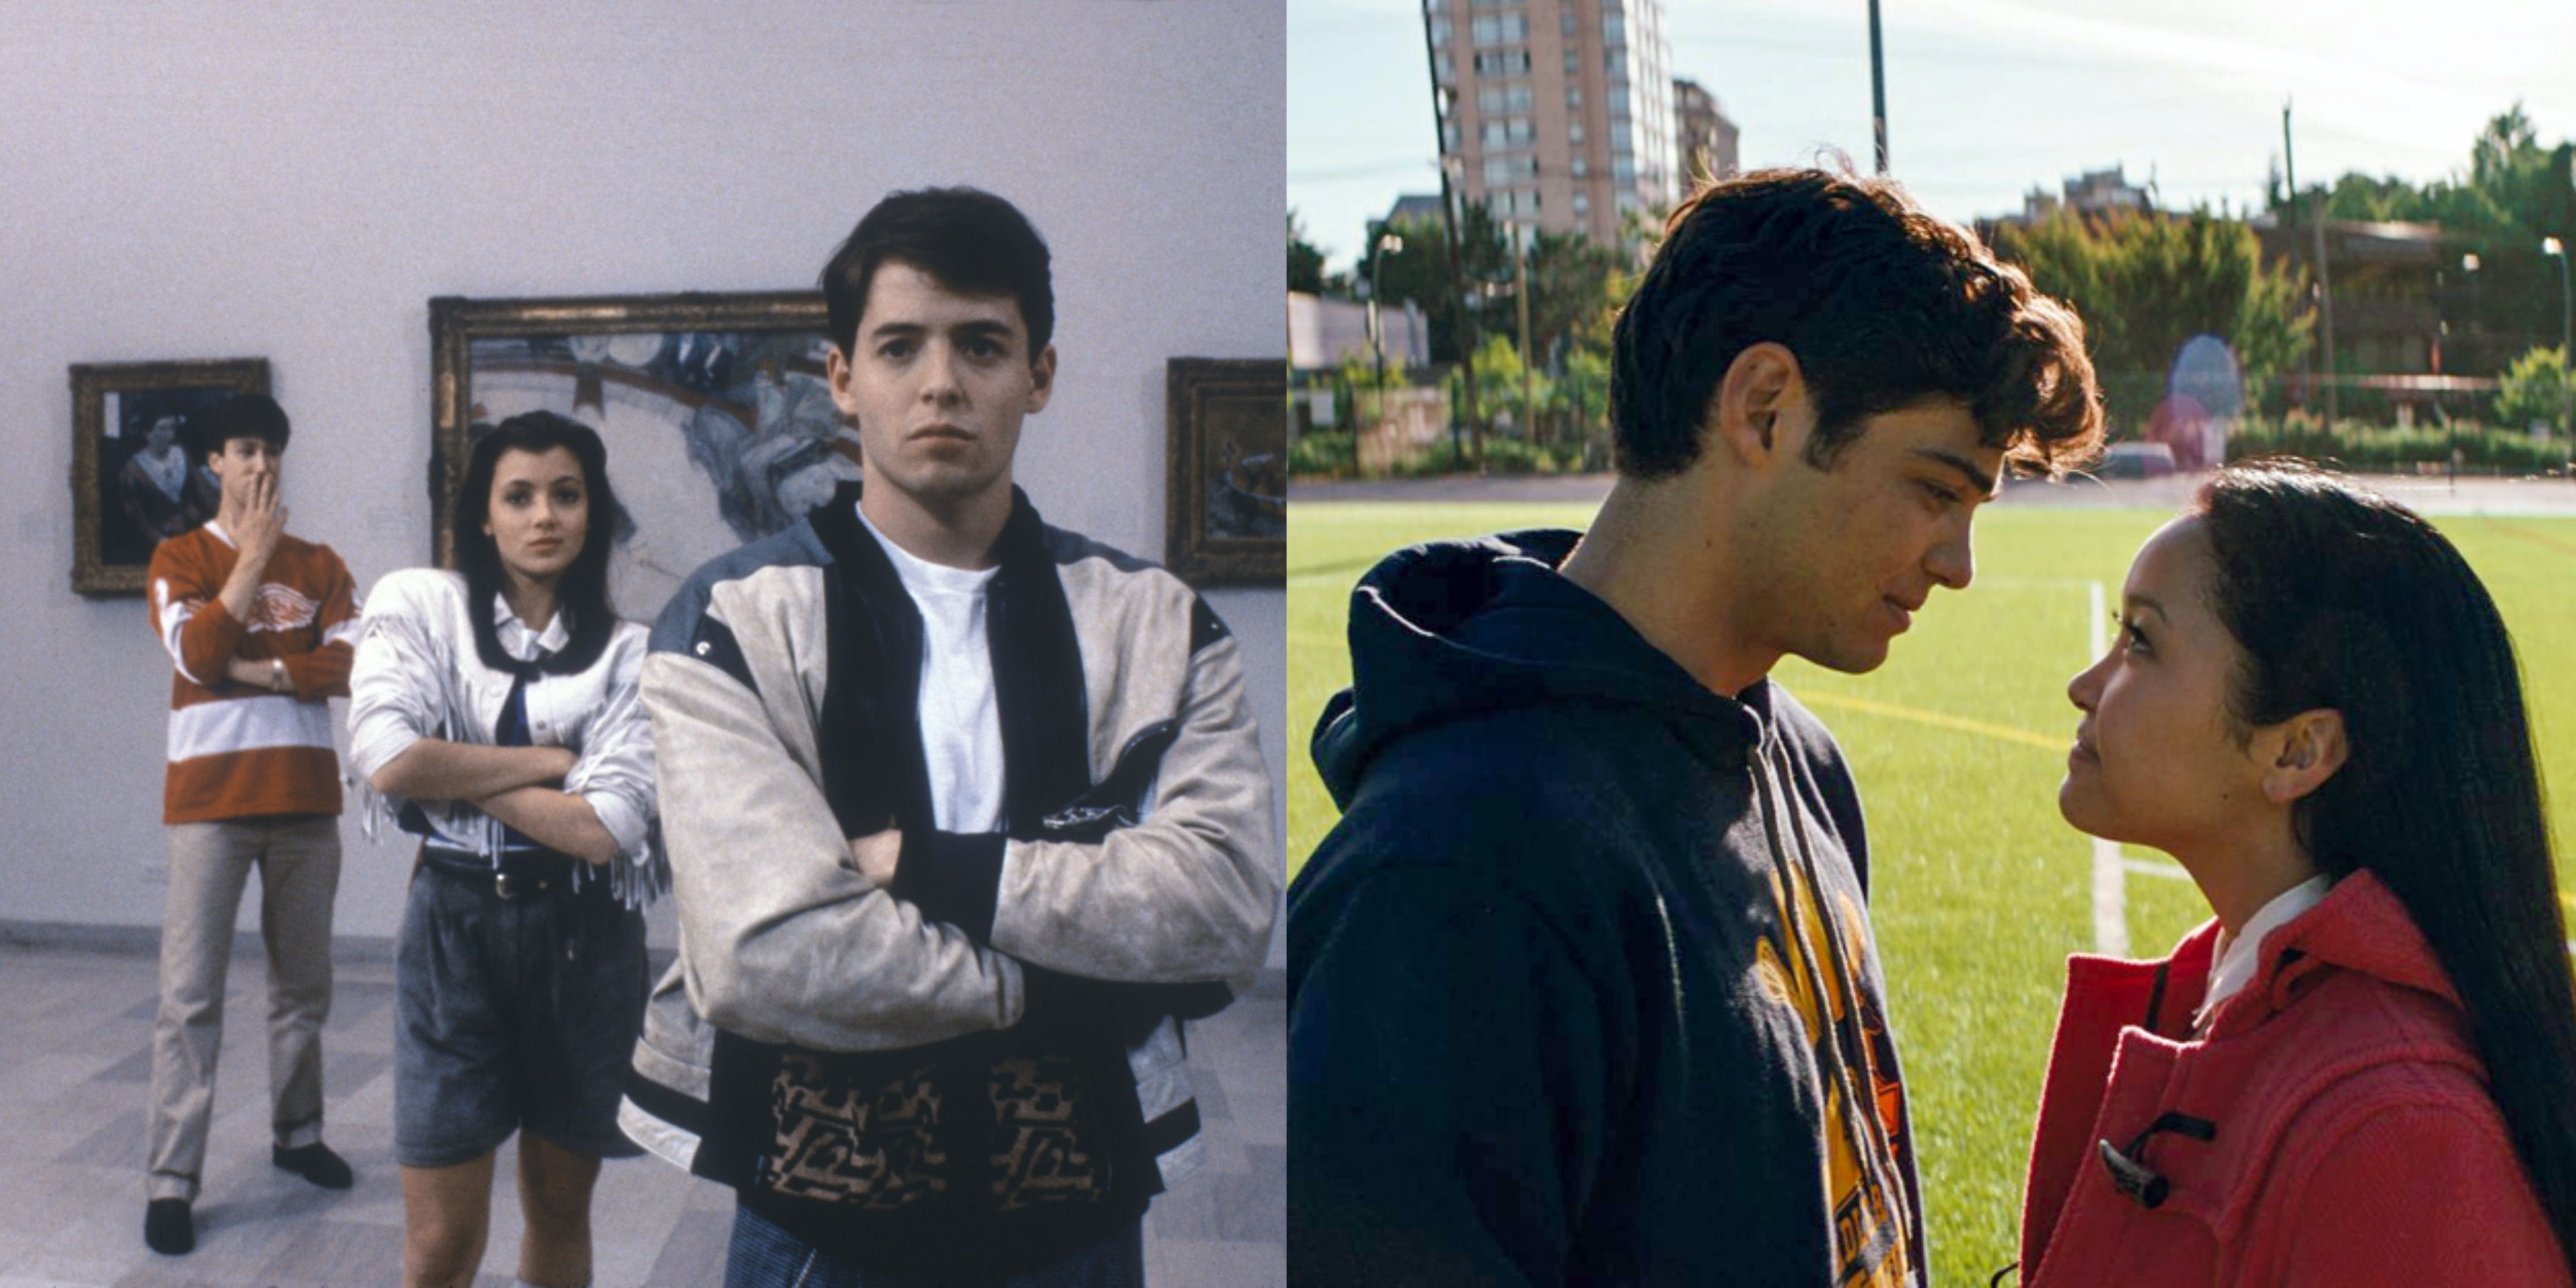 7 Best Teen Movies on Netflix 2020 - Top Teen Films Streaming Now